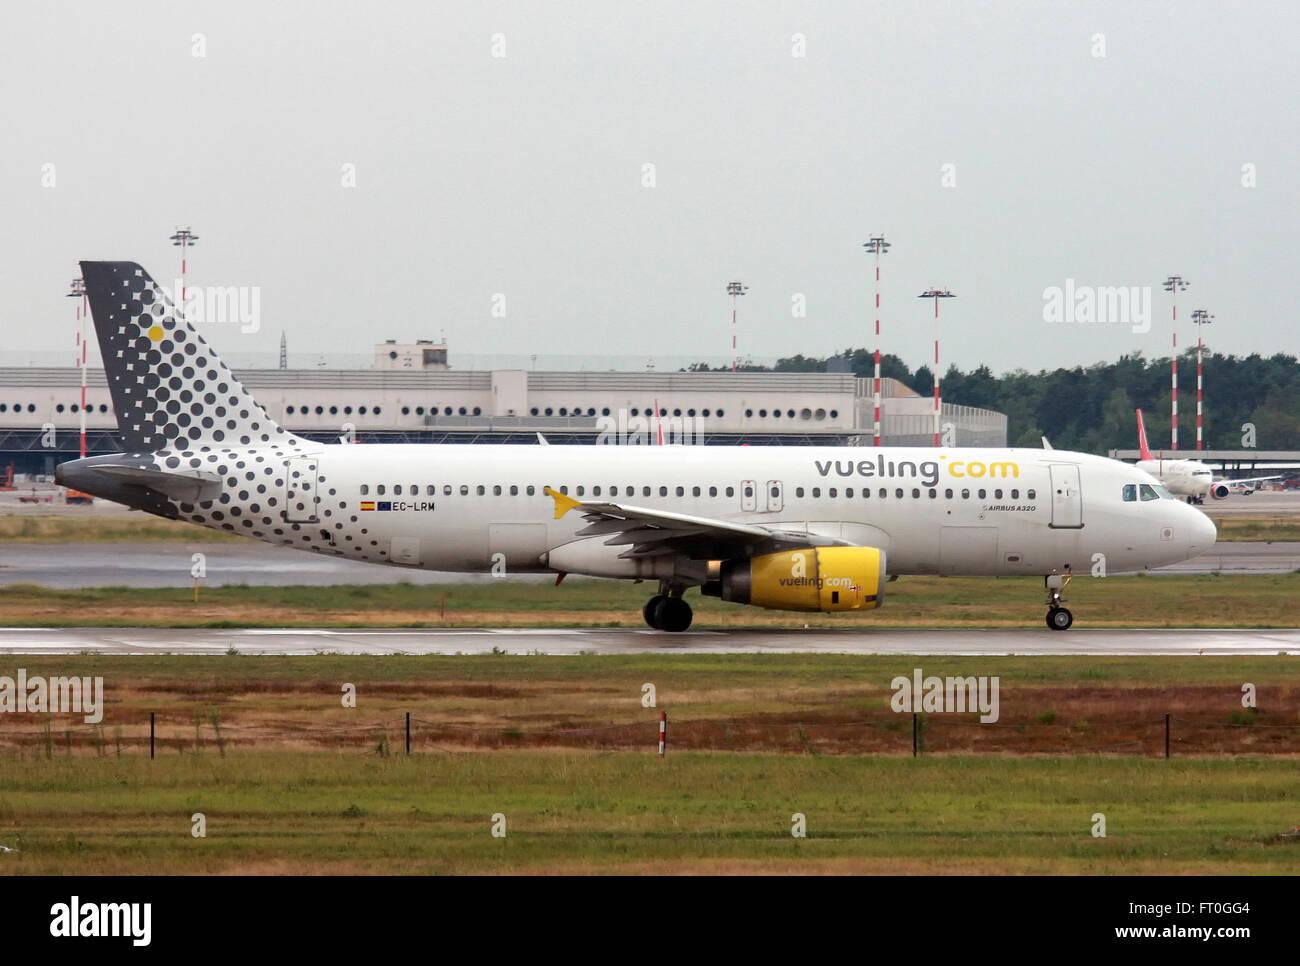 EC-LRM Vueling Airbus A320-200 - Stock Image